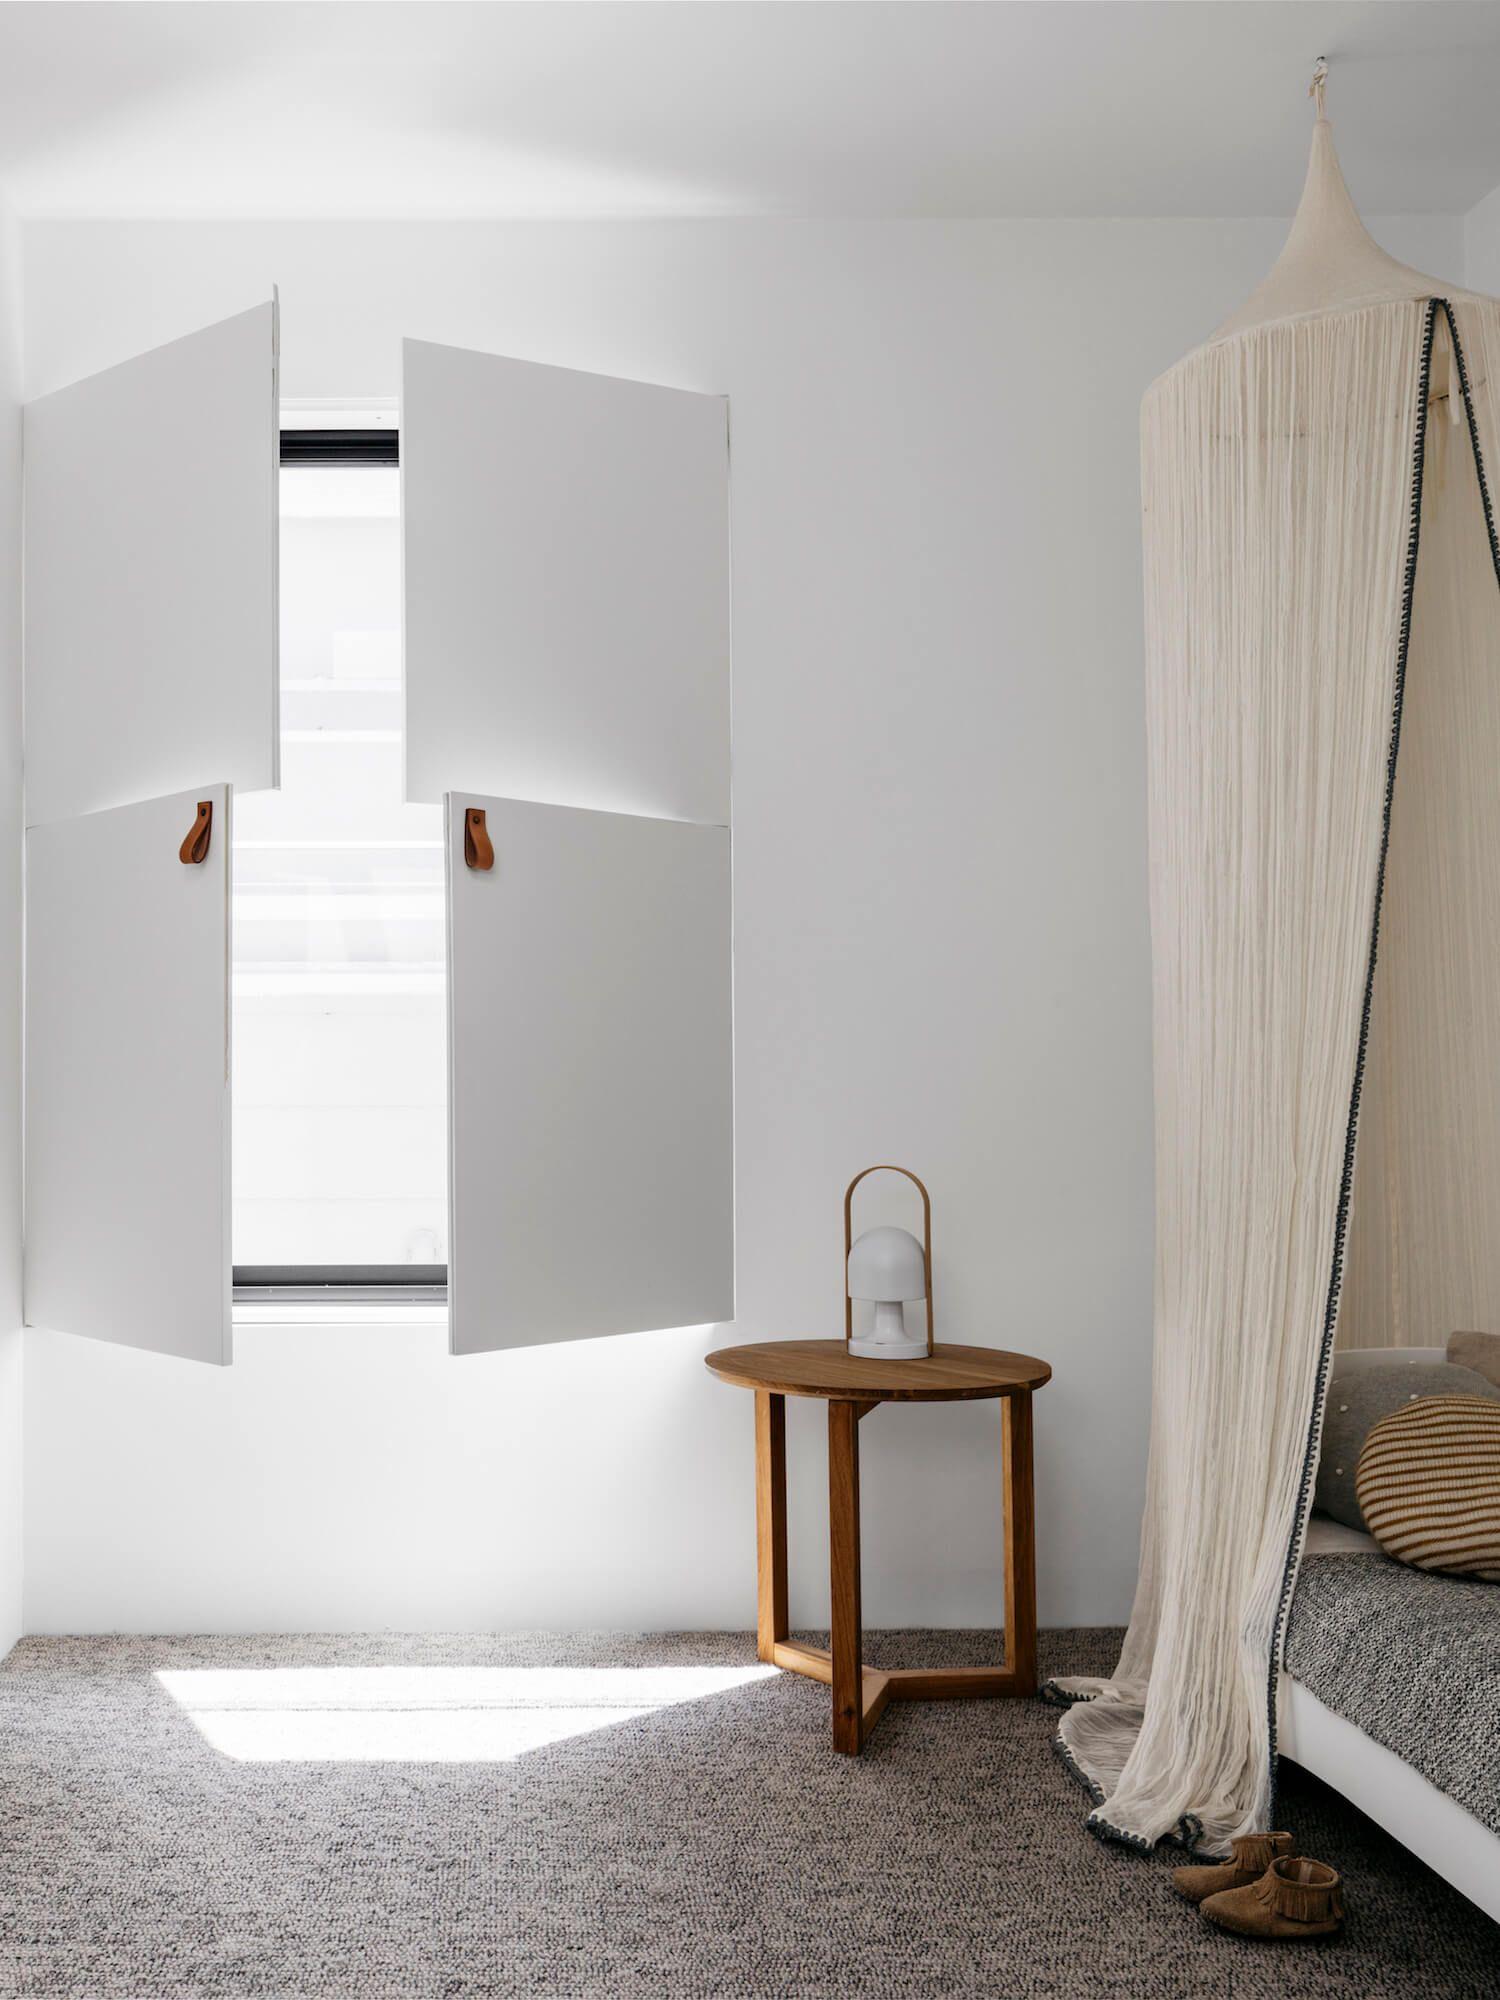 A Family Heirloom By Alexander Co Australian Interiors Est Living Contemporary Interior Design Contemporary Interior Interior